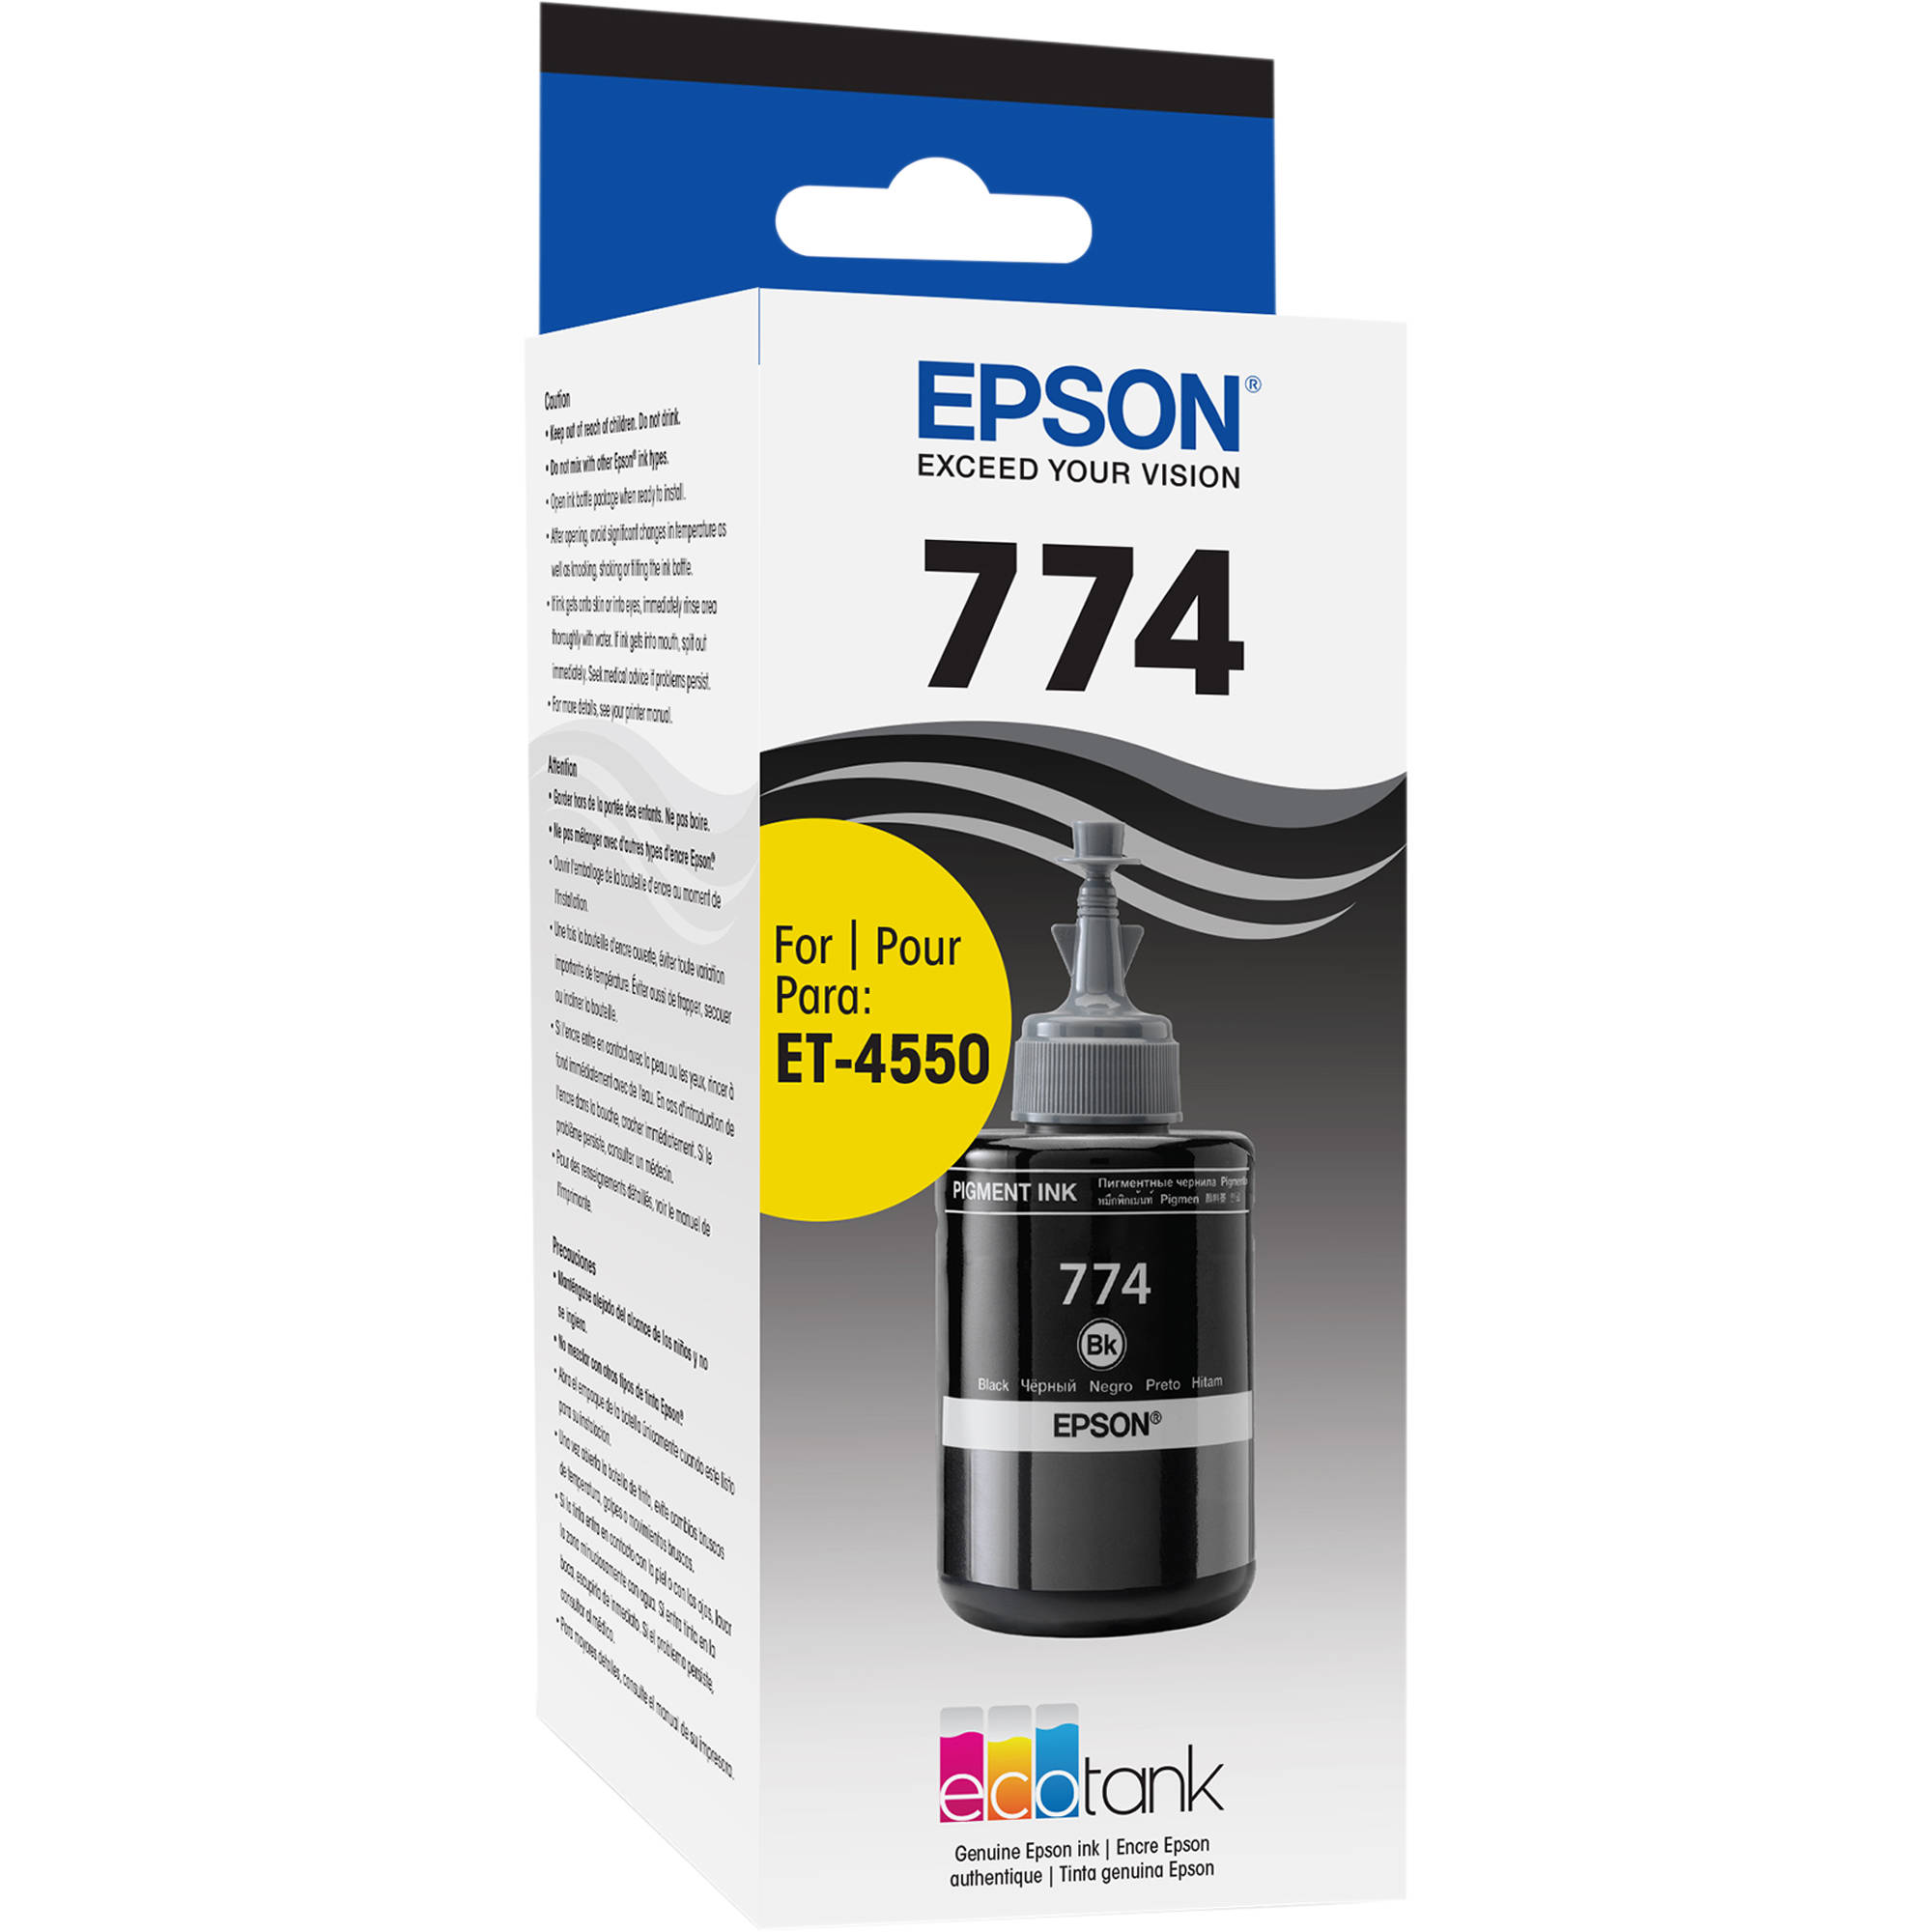 Compare Epson T774 Vs T664 Bh Photo Tinta T6731 Black Ink Bottle 140ml